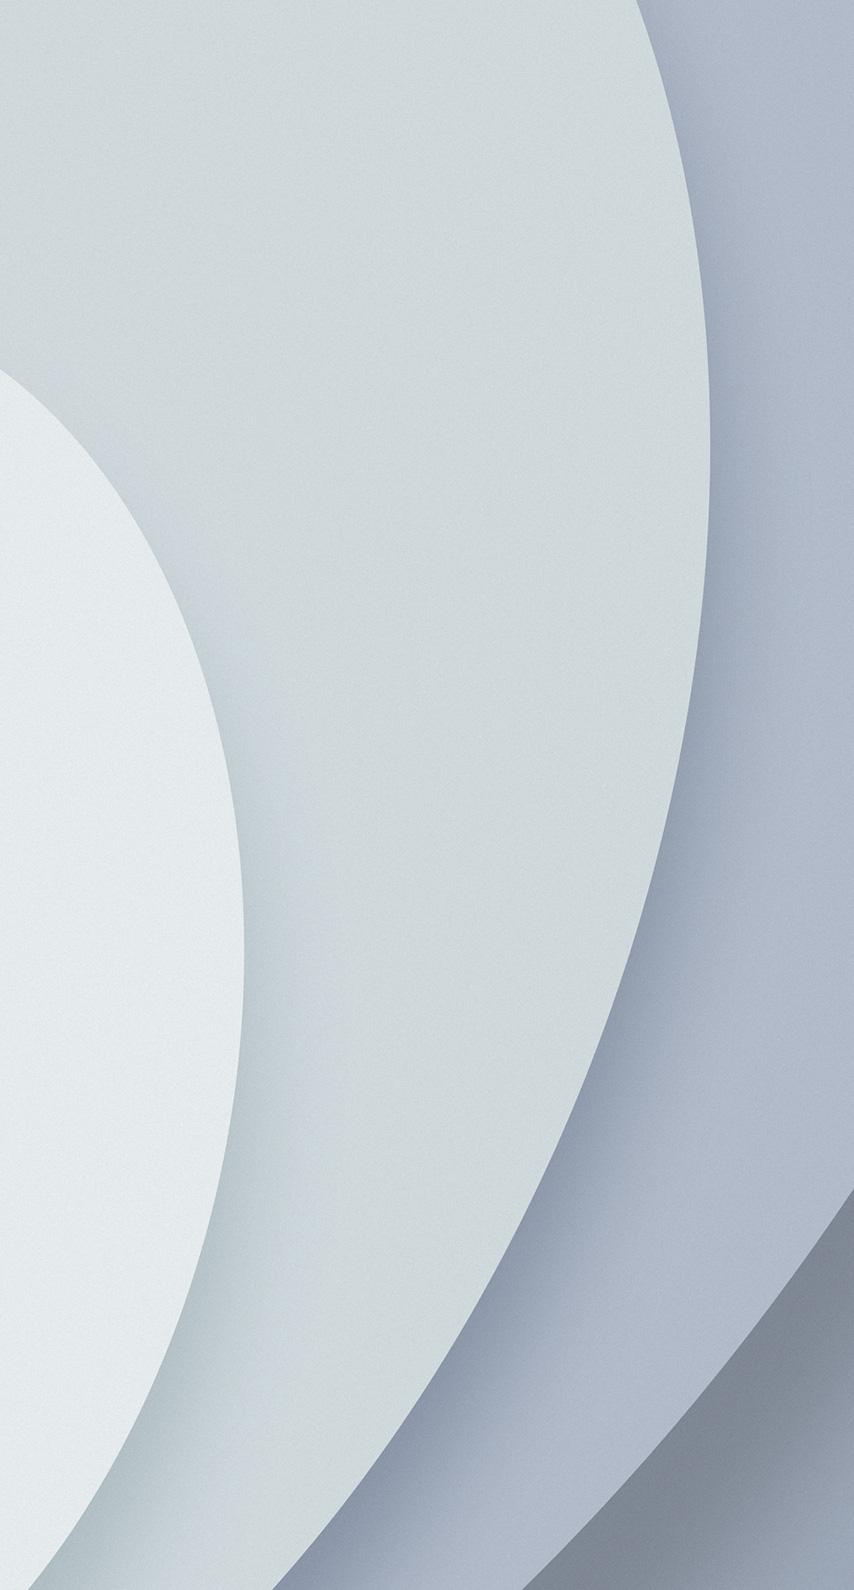 Sfondo Bianco Futuristico Per Iphone O Android Wallpapersforme